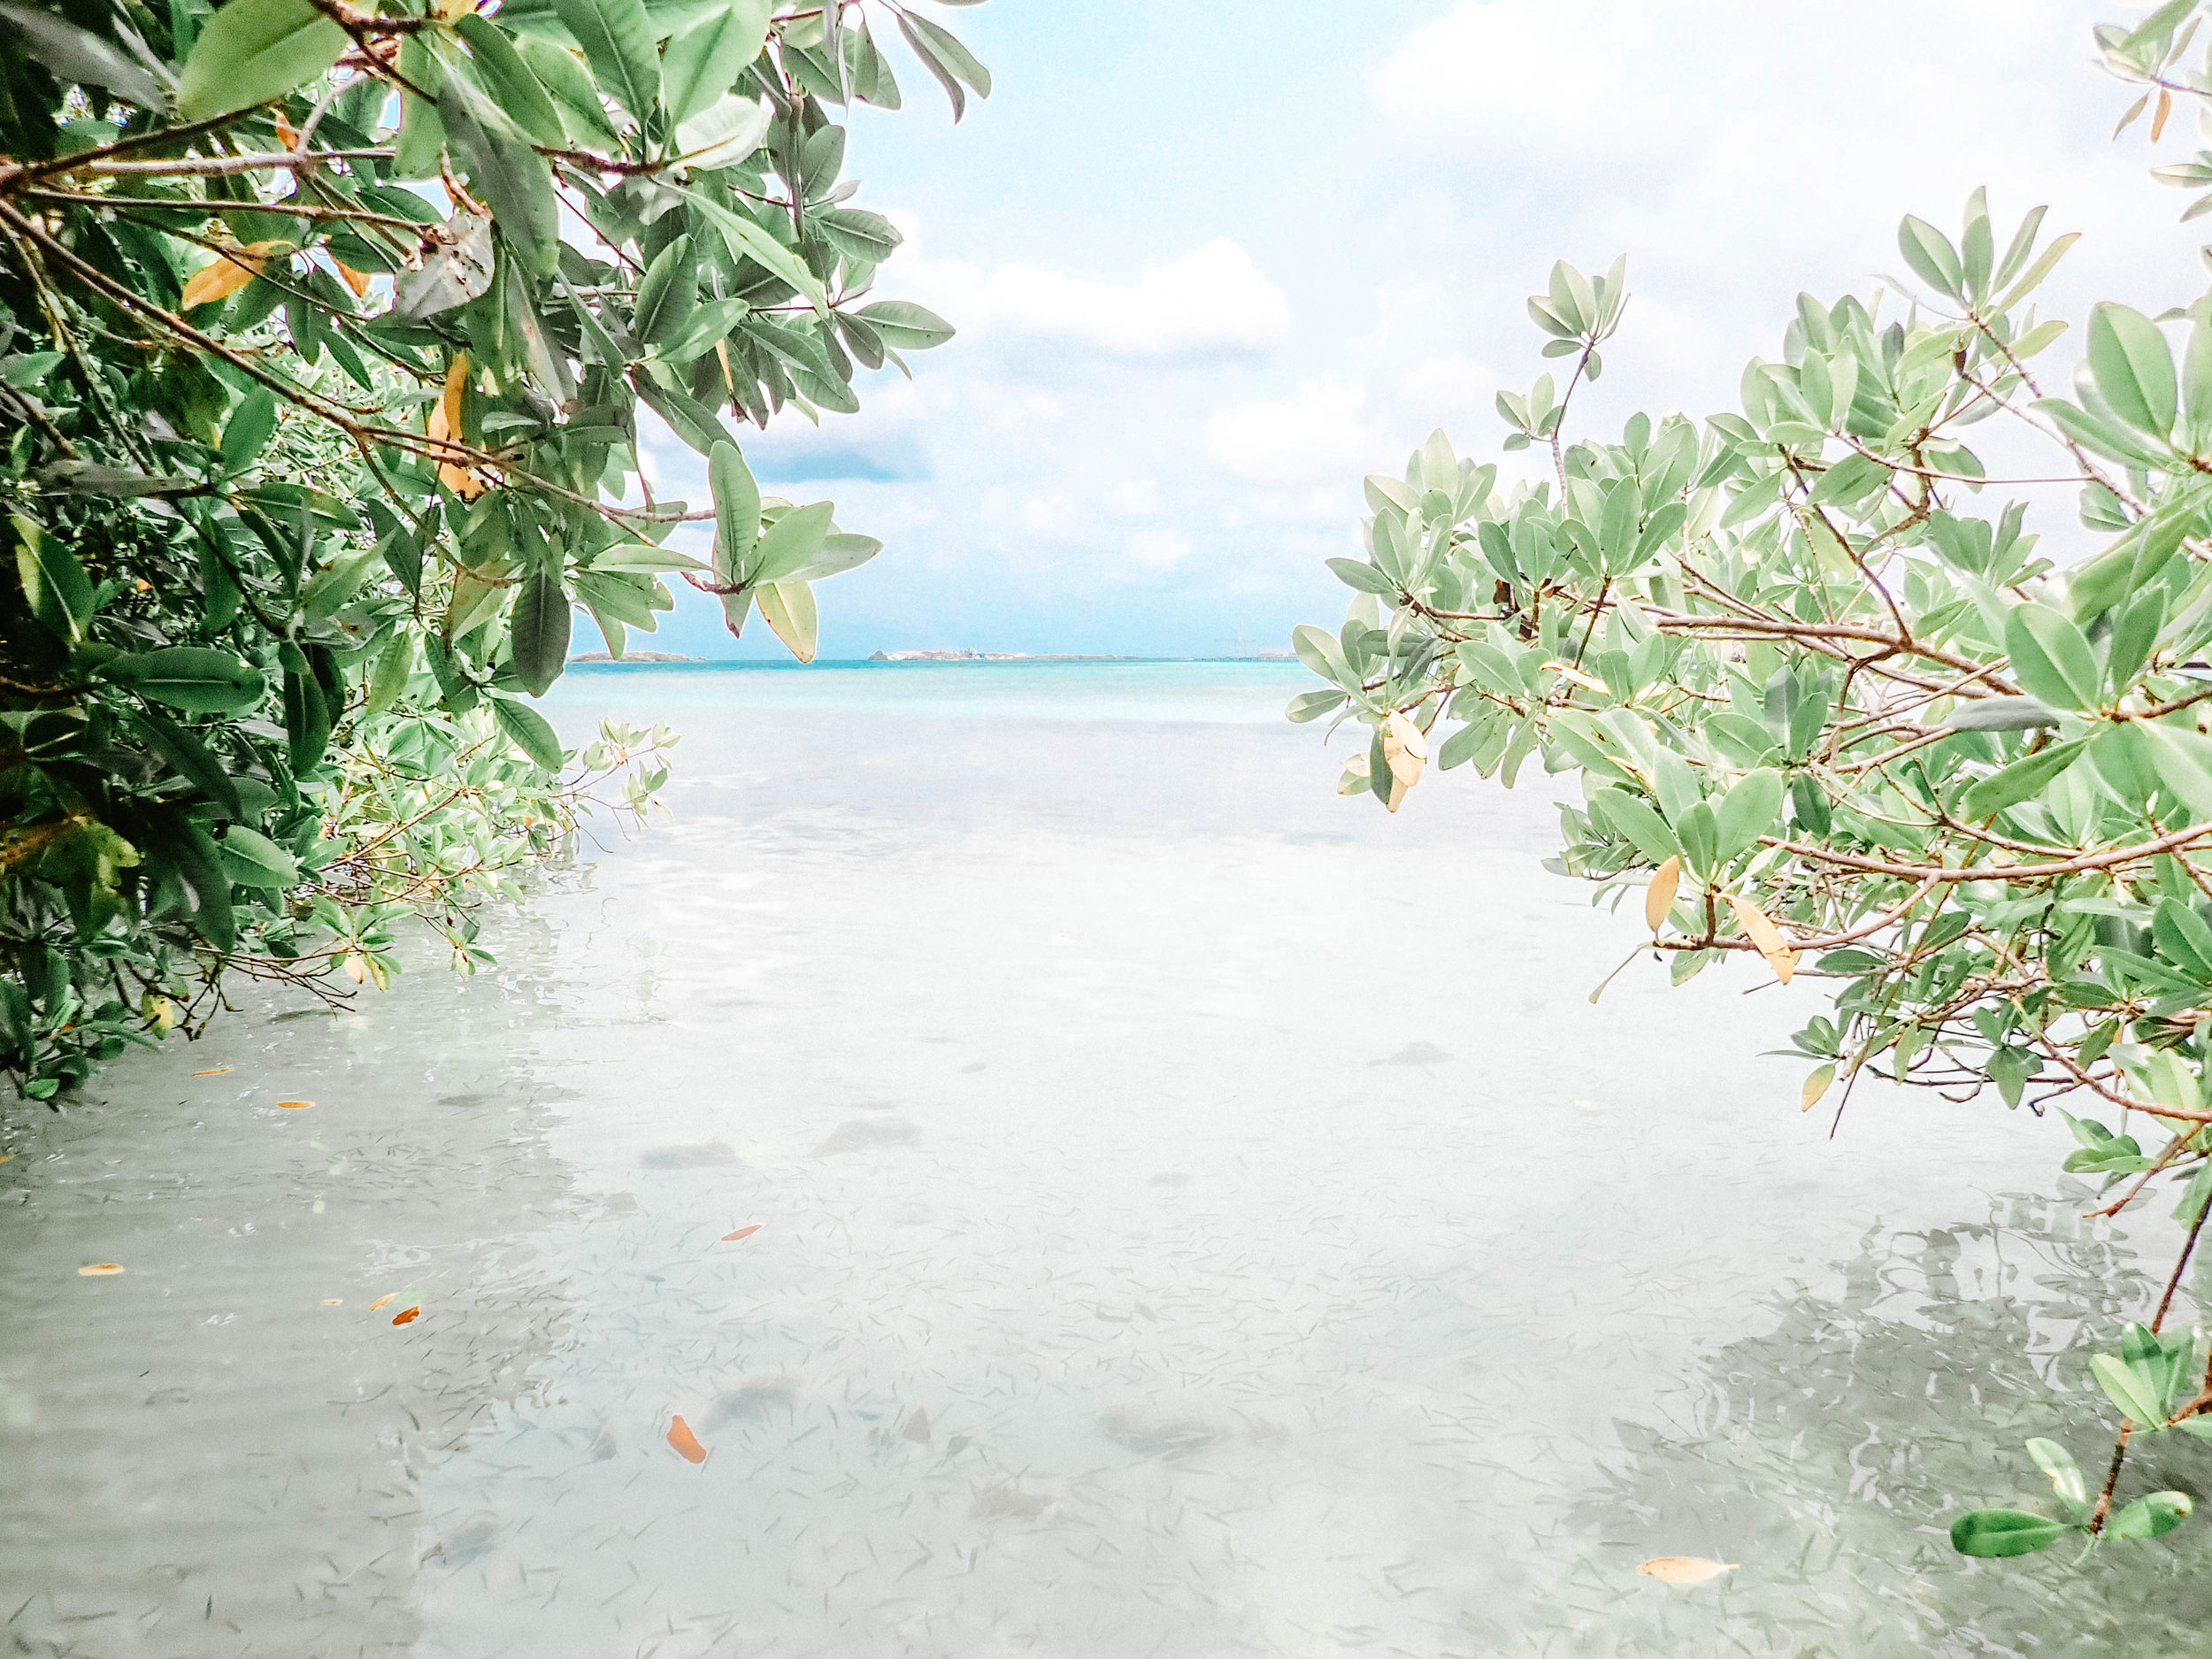 aruba water camera 2019.jpg